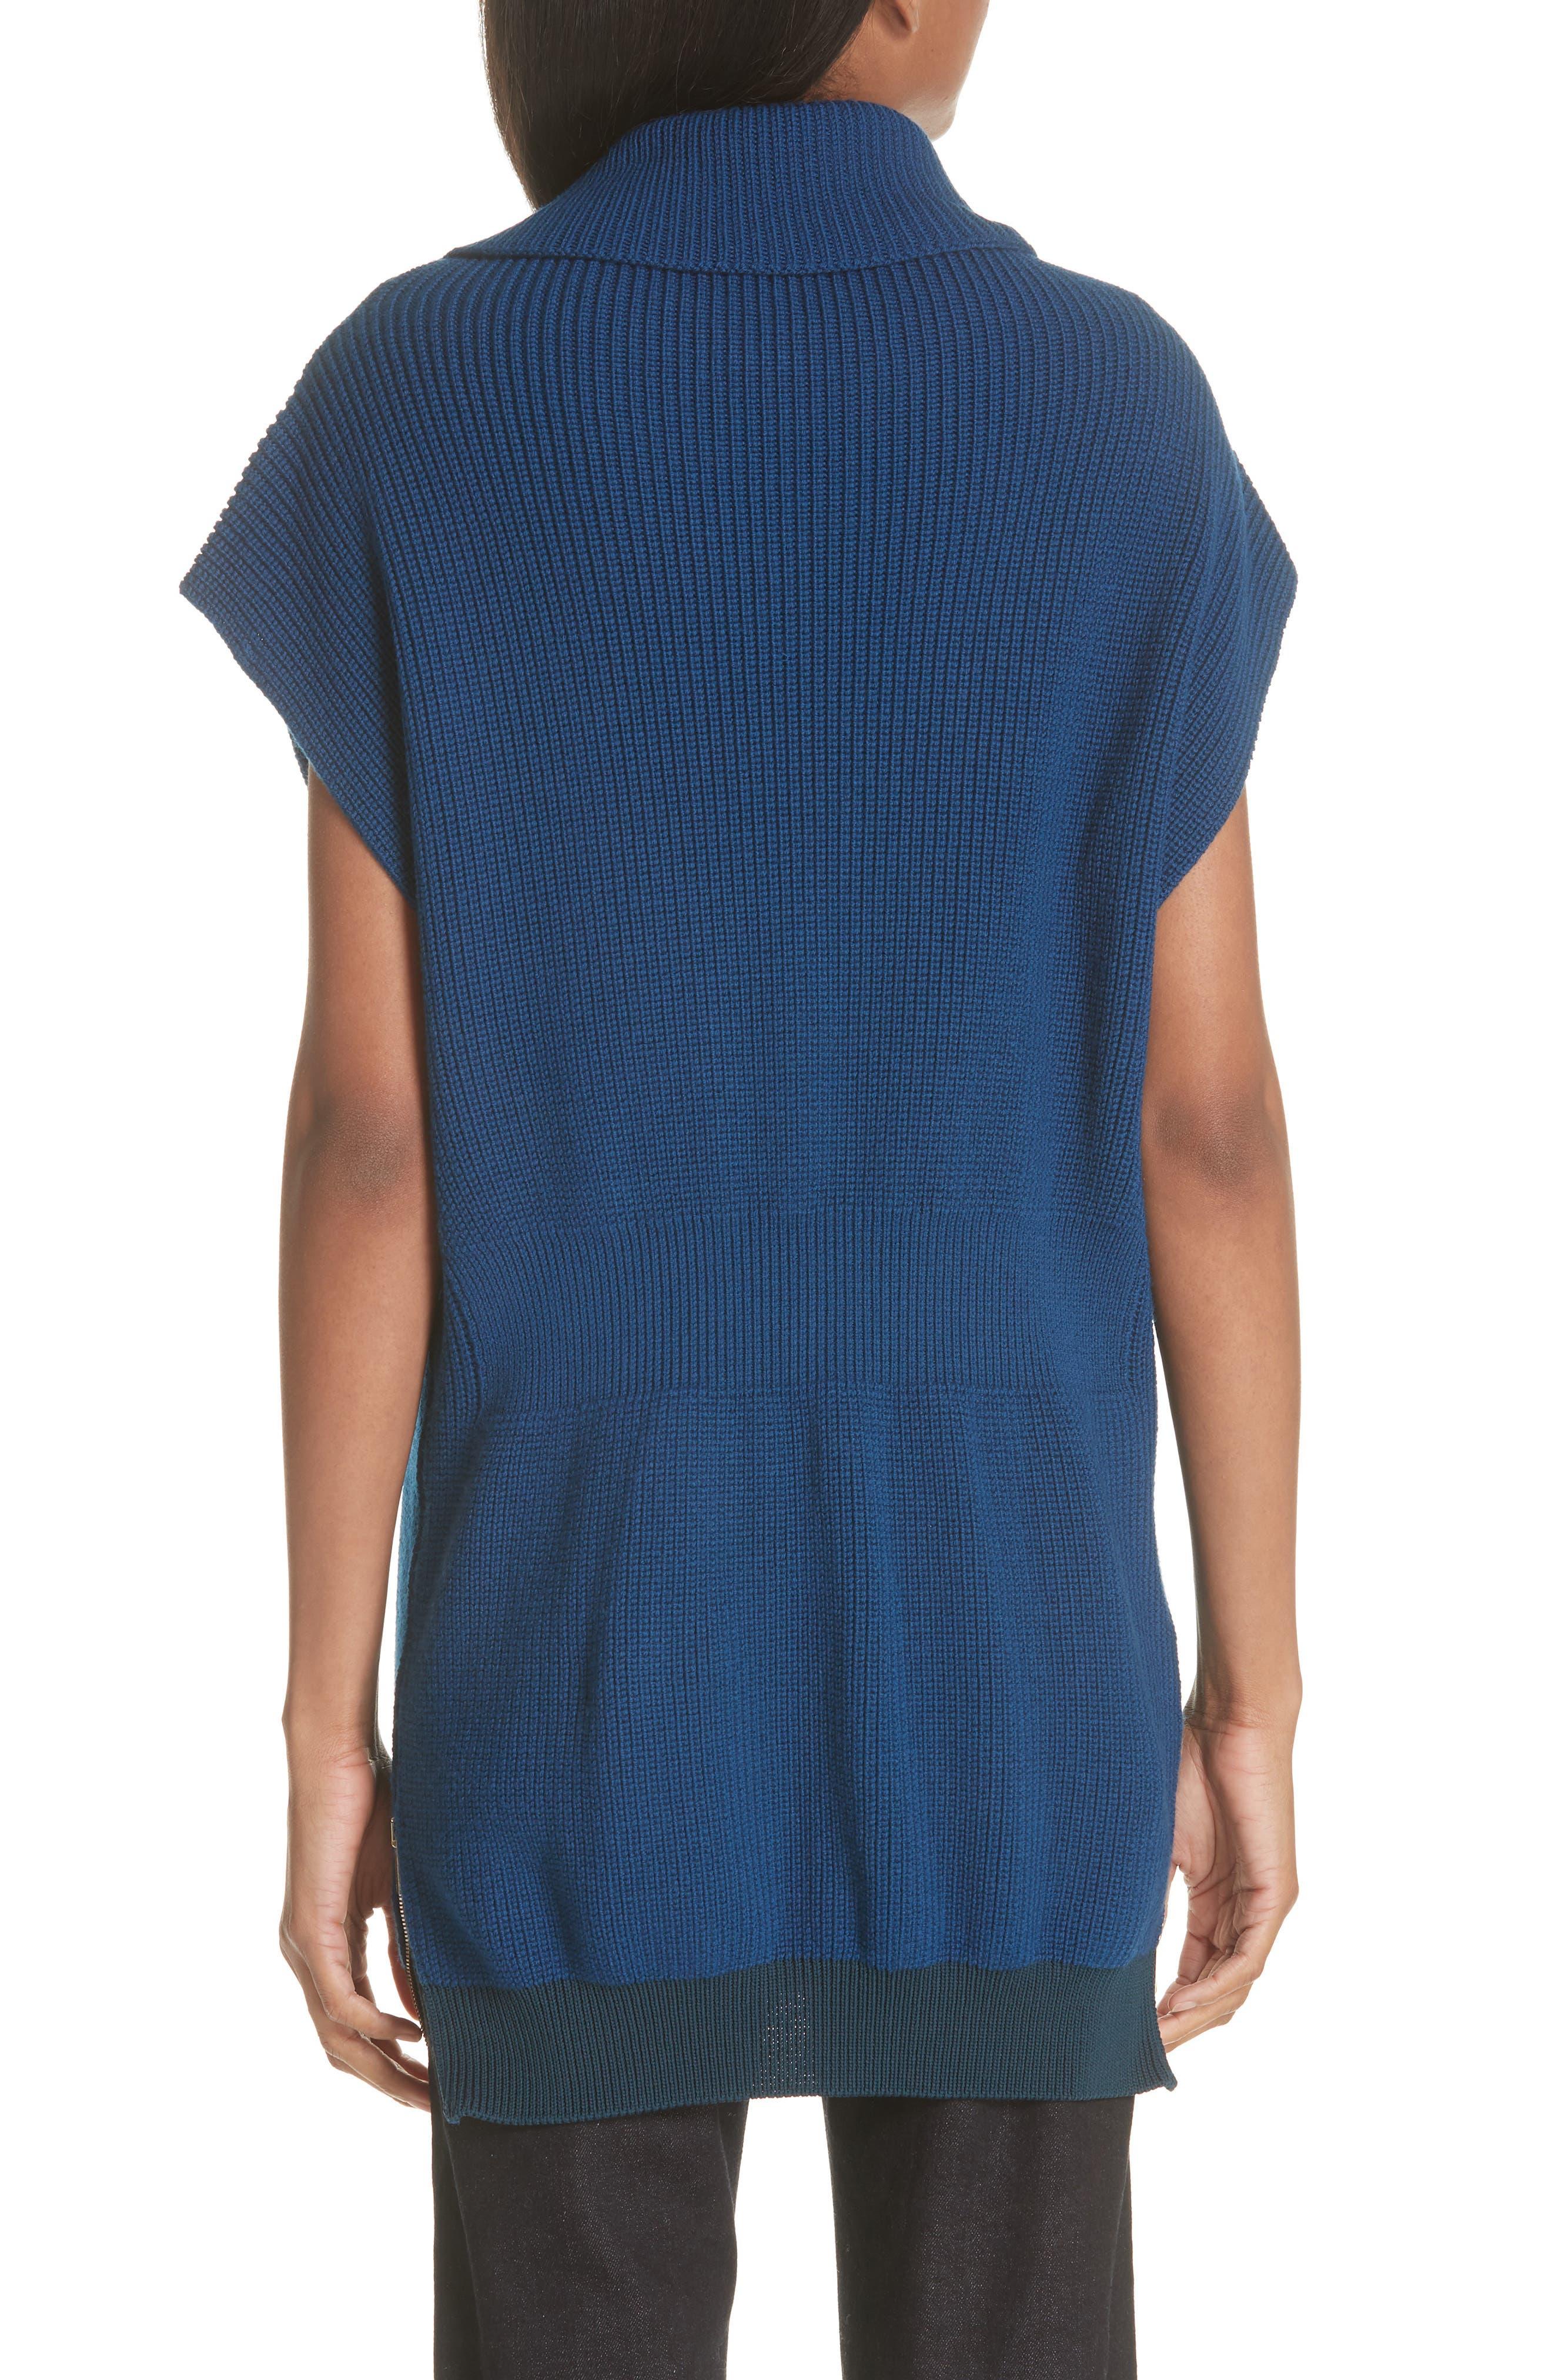 Wool Turtleneck Vest,                             Alternate thumbnail 2, color,                             SHADOW BLUE